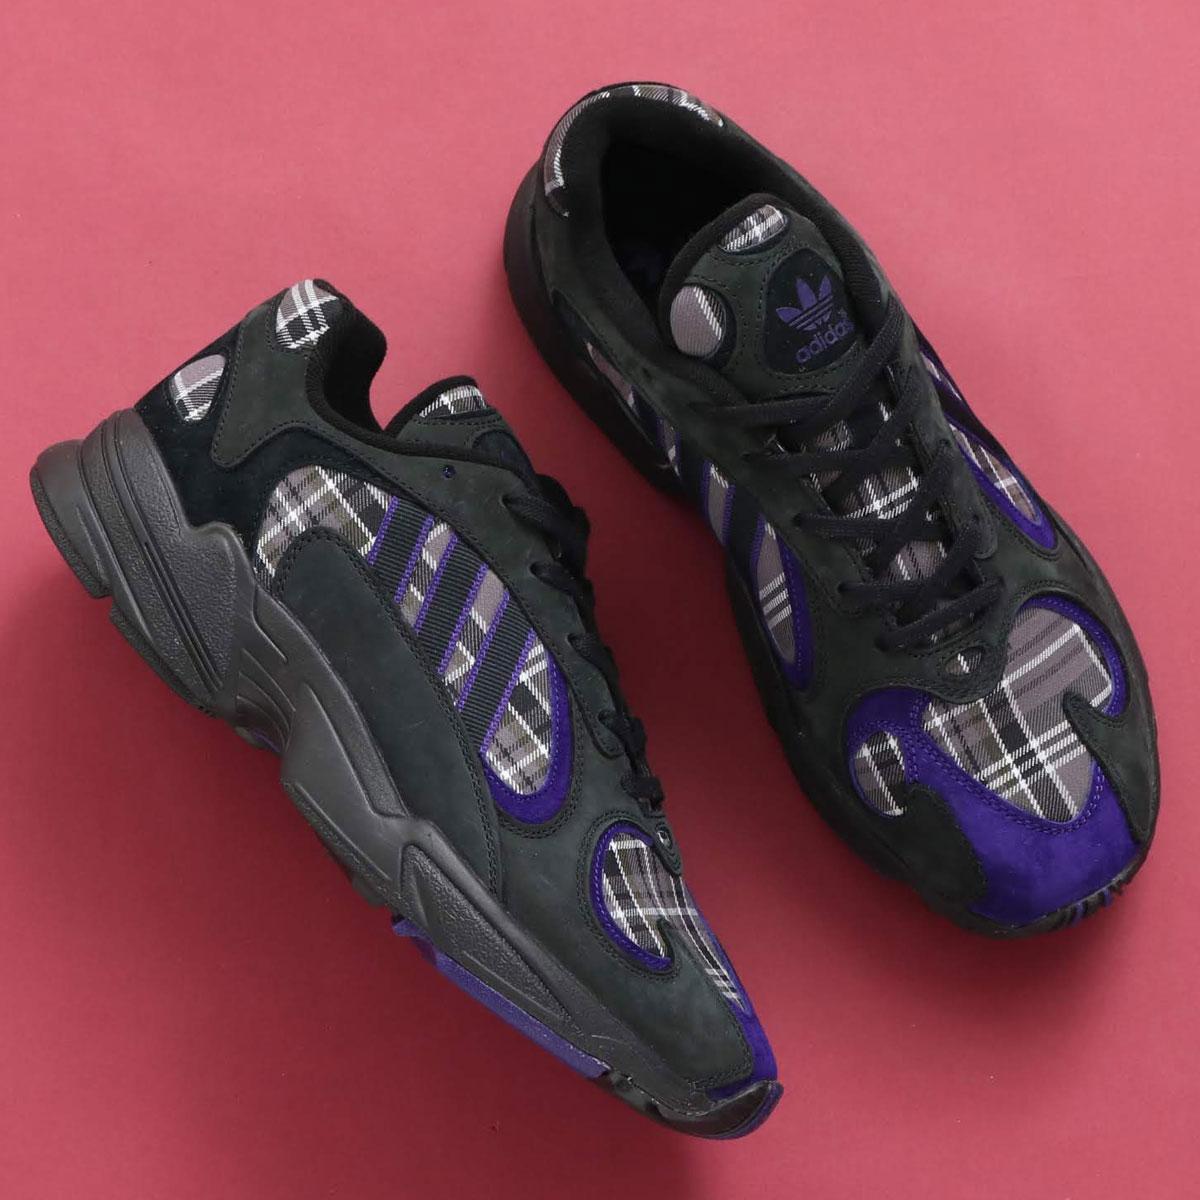 adidas Originals YUNG-1(アディダスオリジナルス ヤング-1)CORE BLACK/COLLEGE PURPLE/CORE BLACK【メンズ レディース スニーカー】19SS-I